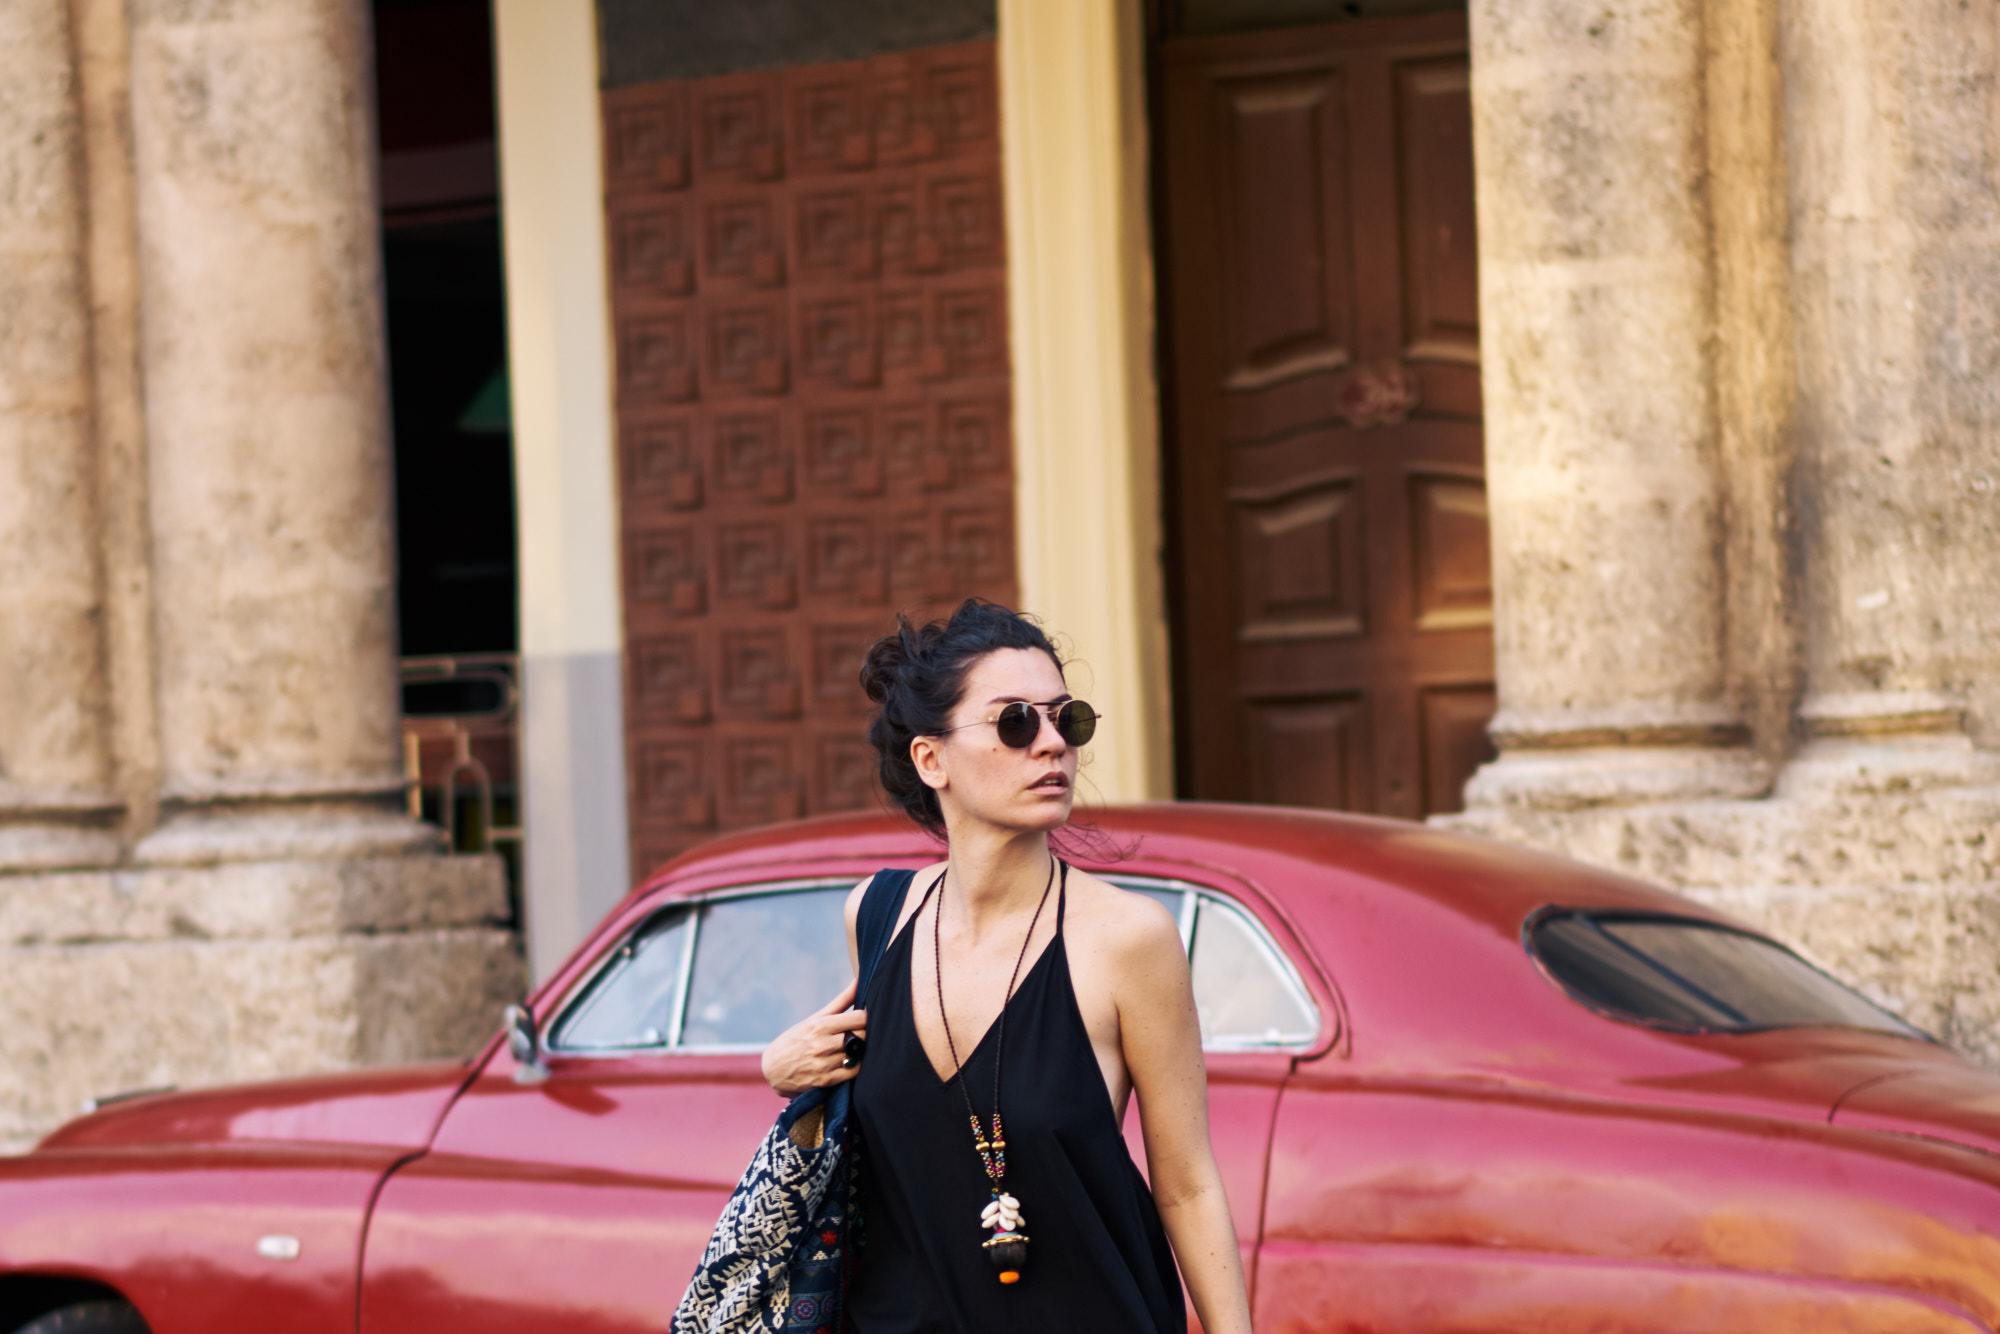 billur saatci, offnegiysem, street style, turkish style blogger, cuba, küba, billurcubadiary, offnereyegitsem,